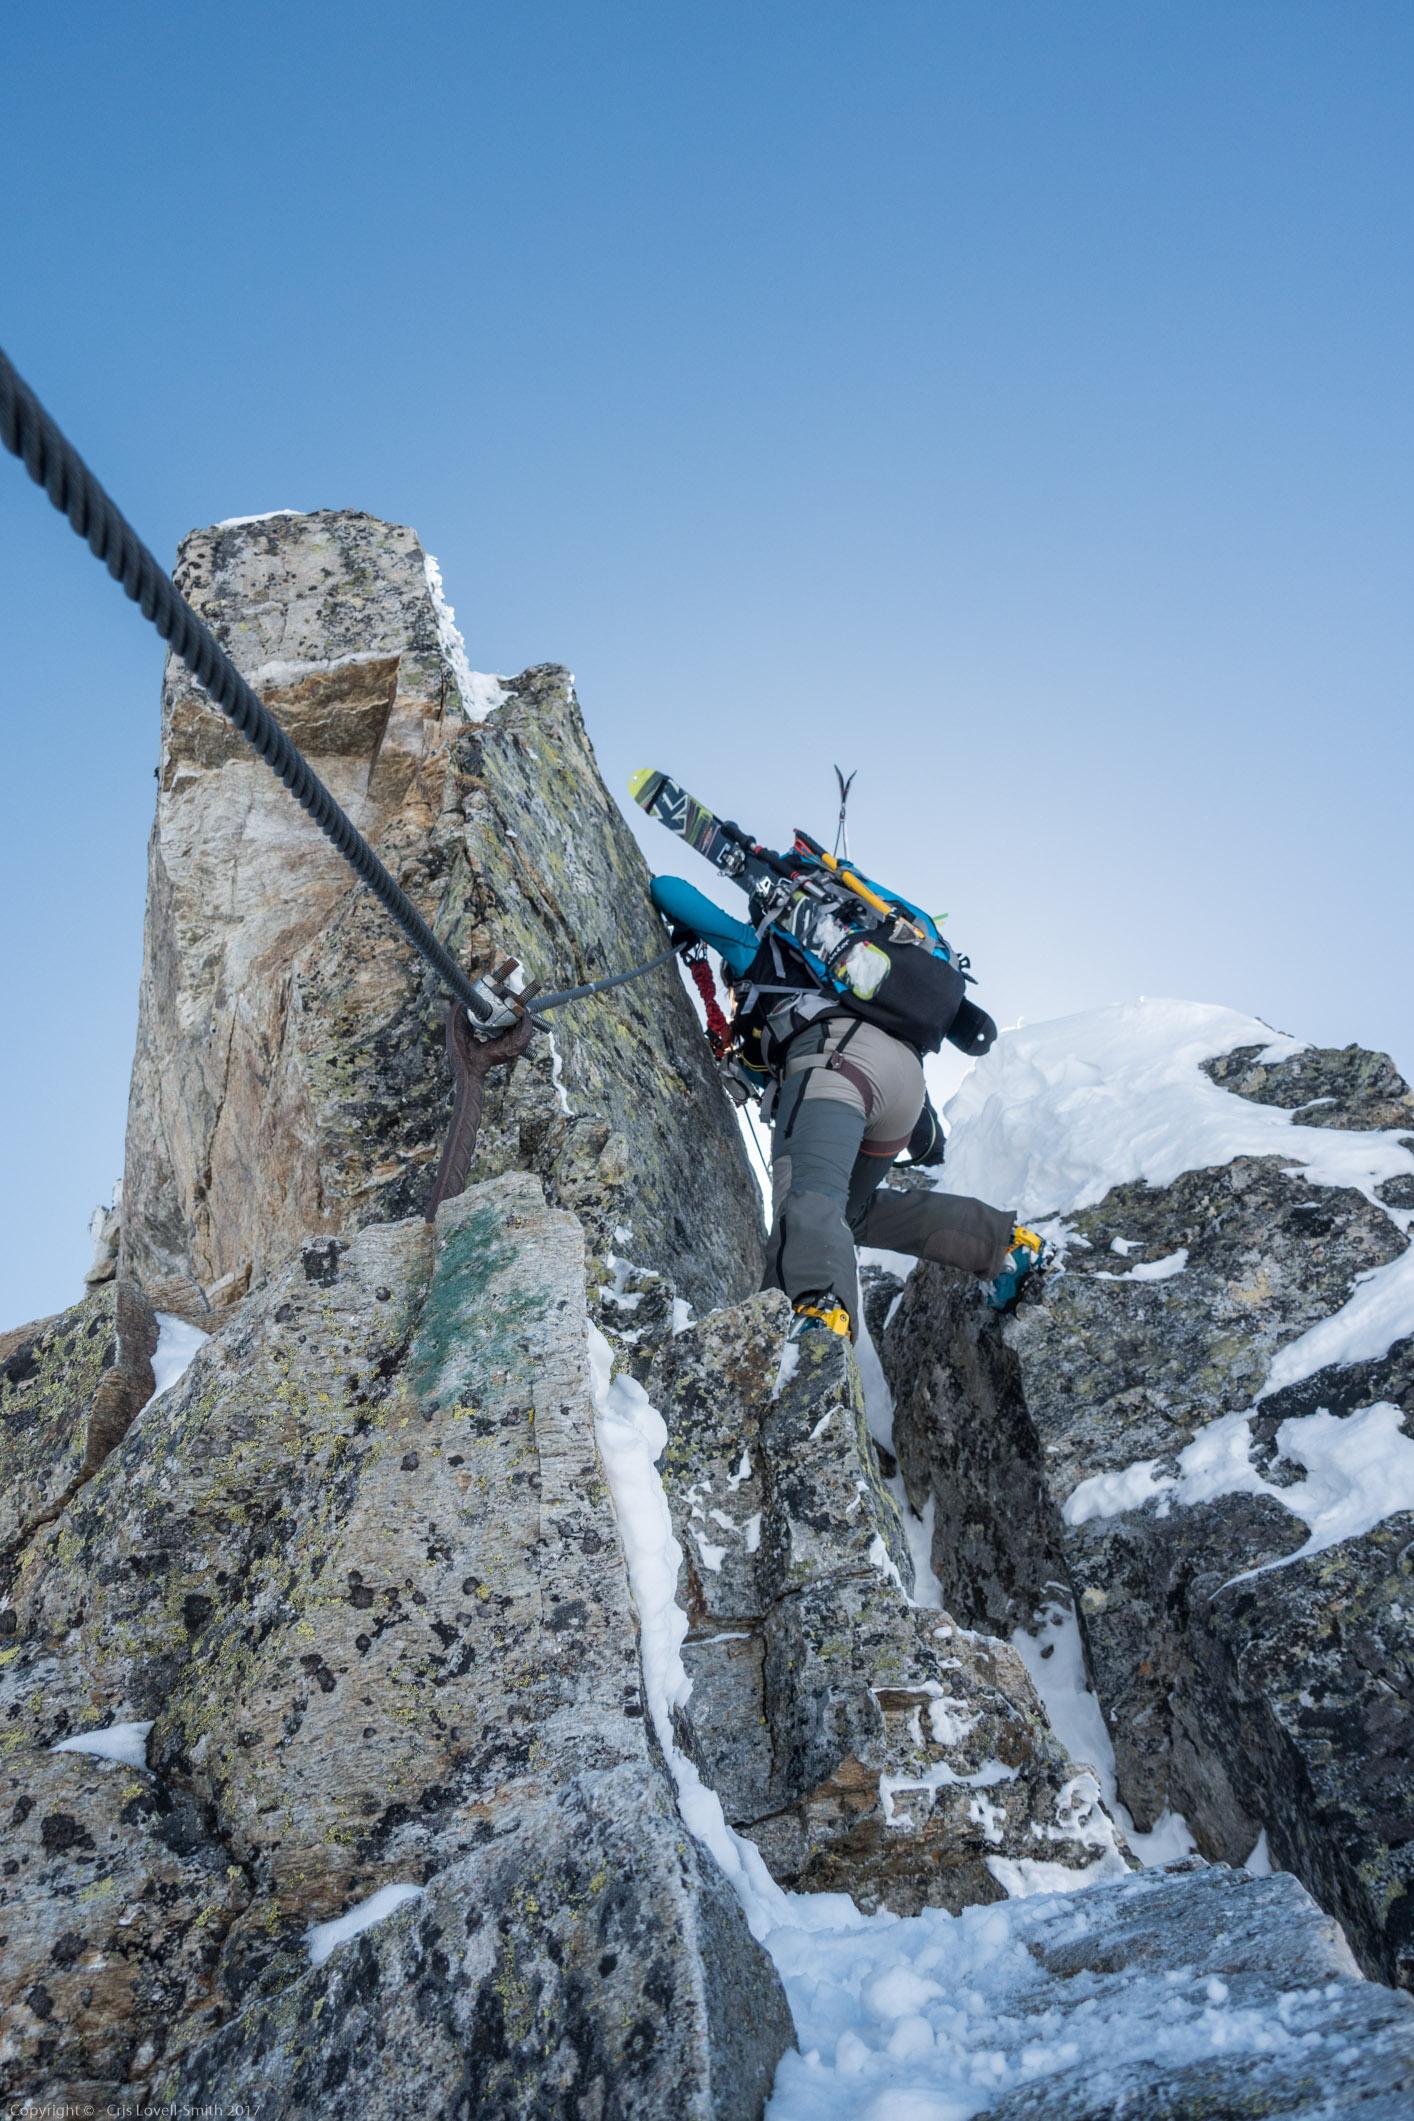 Leonie on the D section (Arlberger Winterklettersteig March 2017)